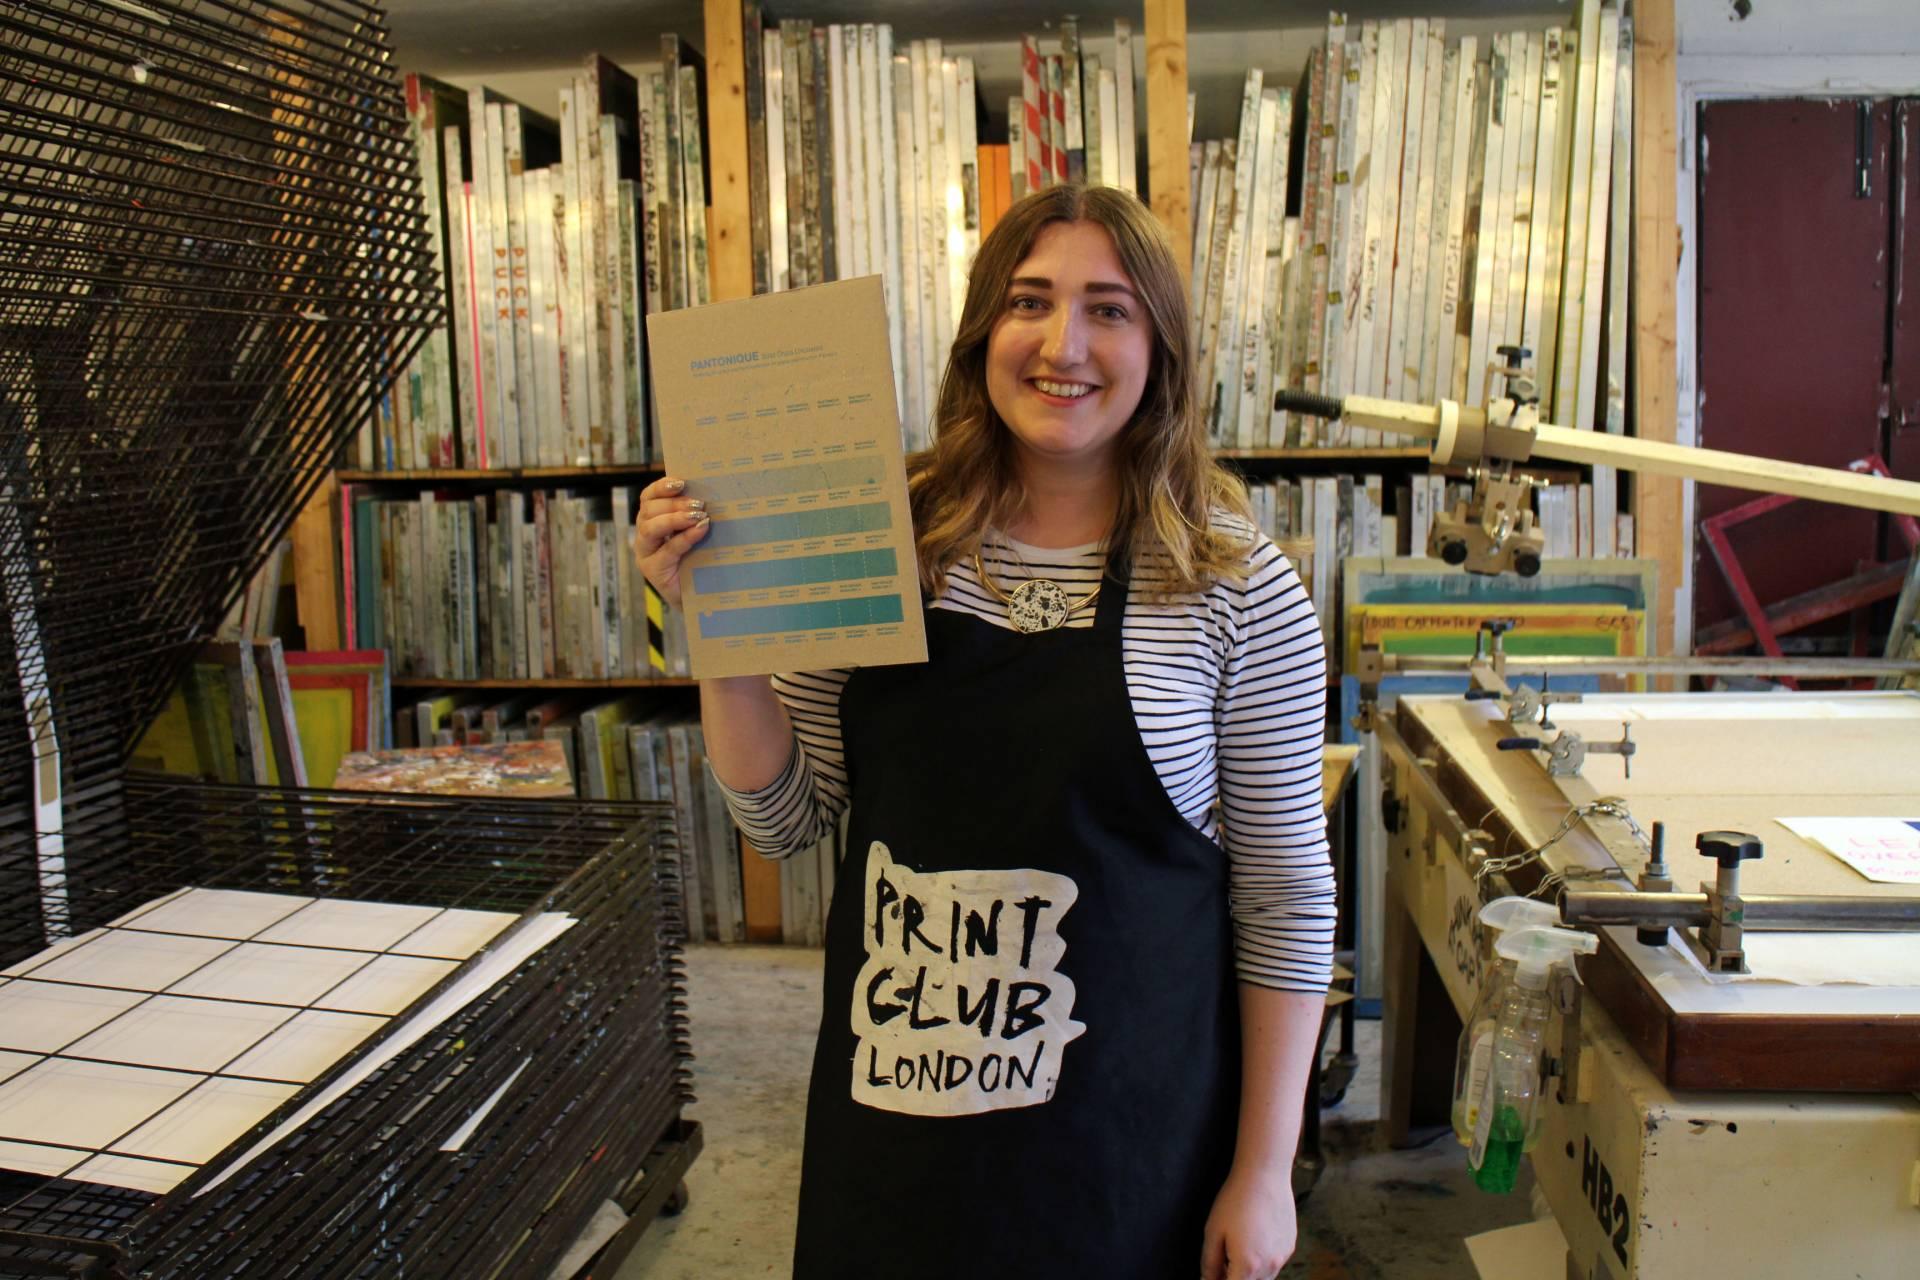 Screen Printing Workshop Print Club London